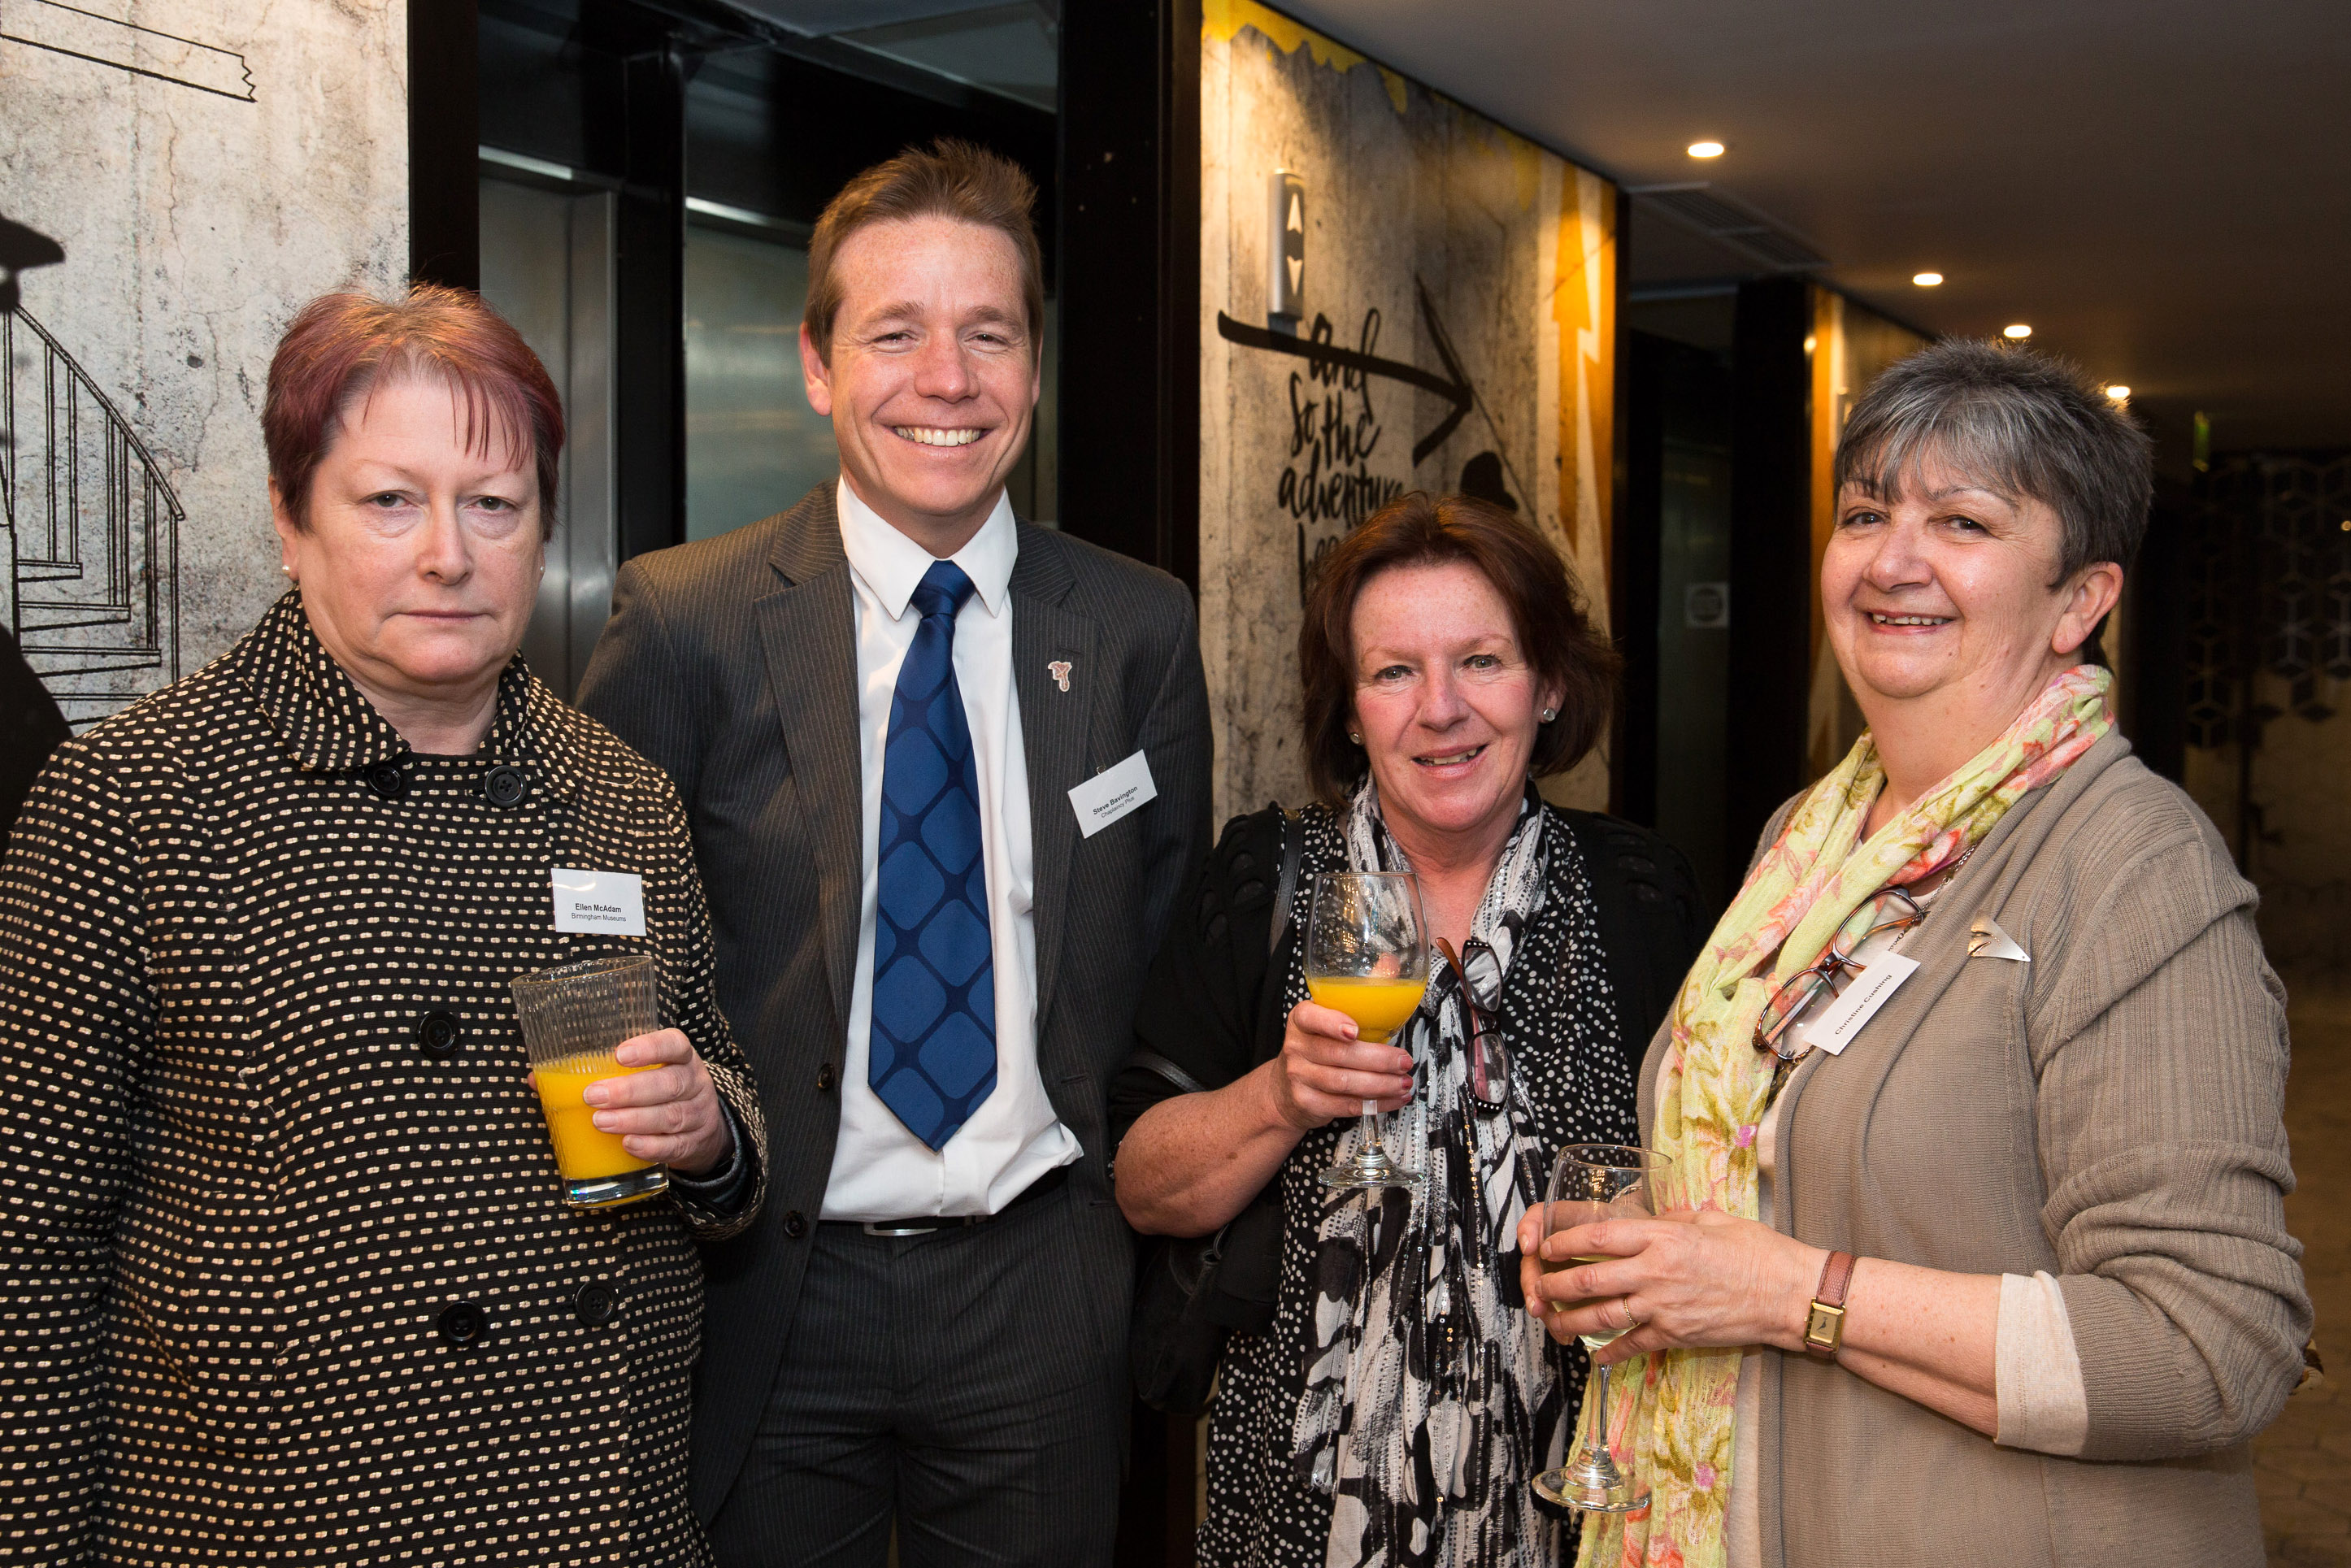 Pictured from left, Ellen McAdam, Steve Bavington, Sue Behan, Christine Cushing.